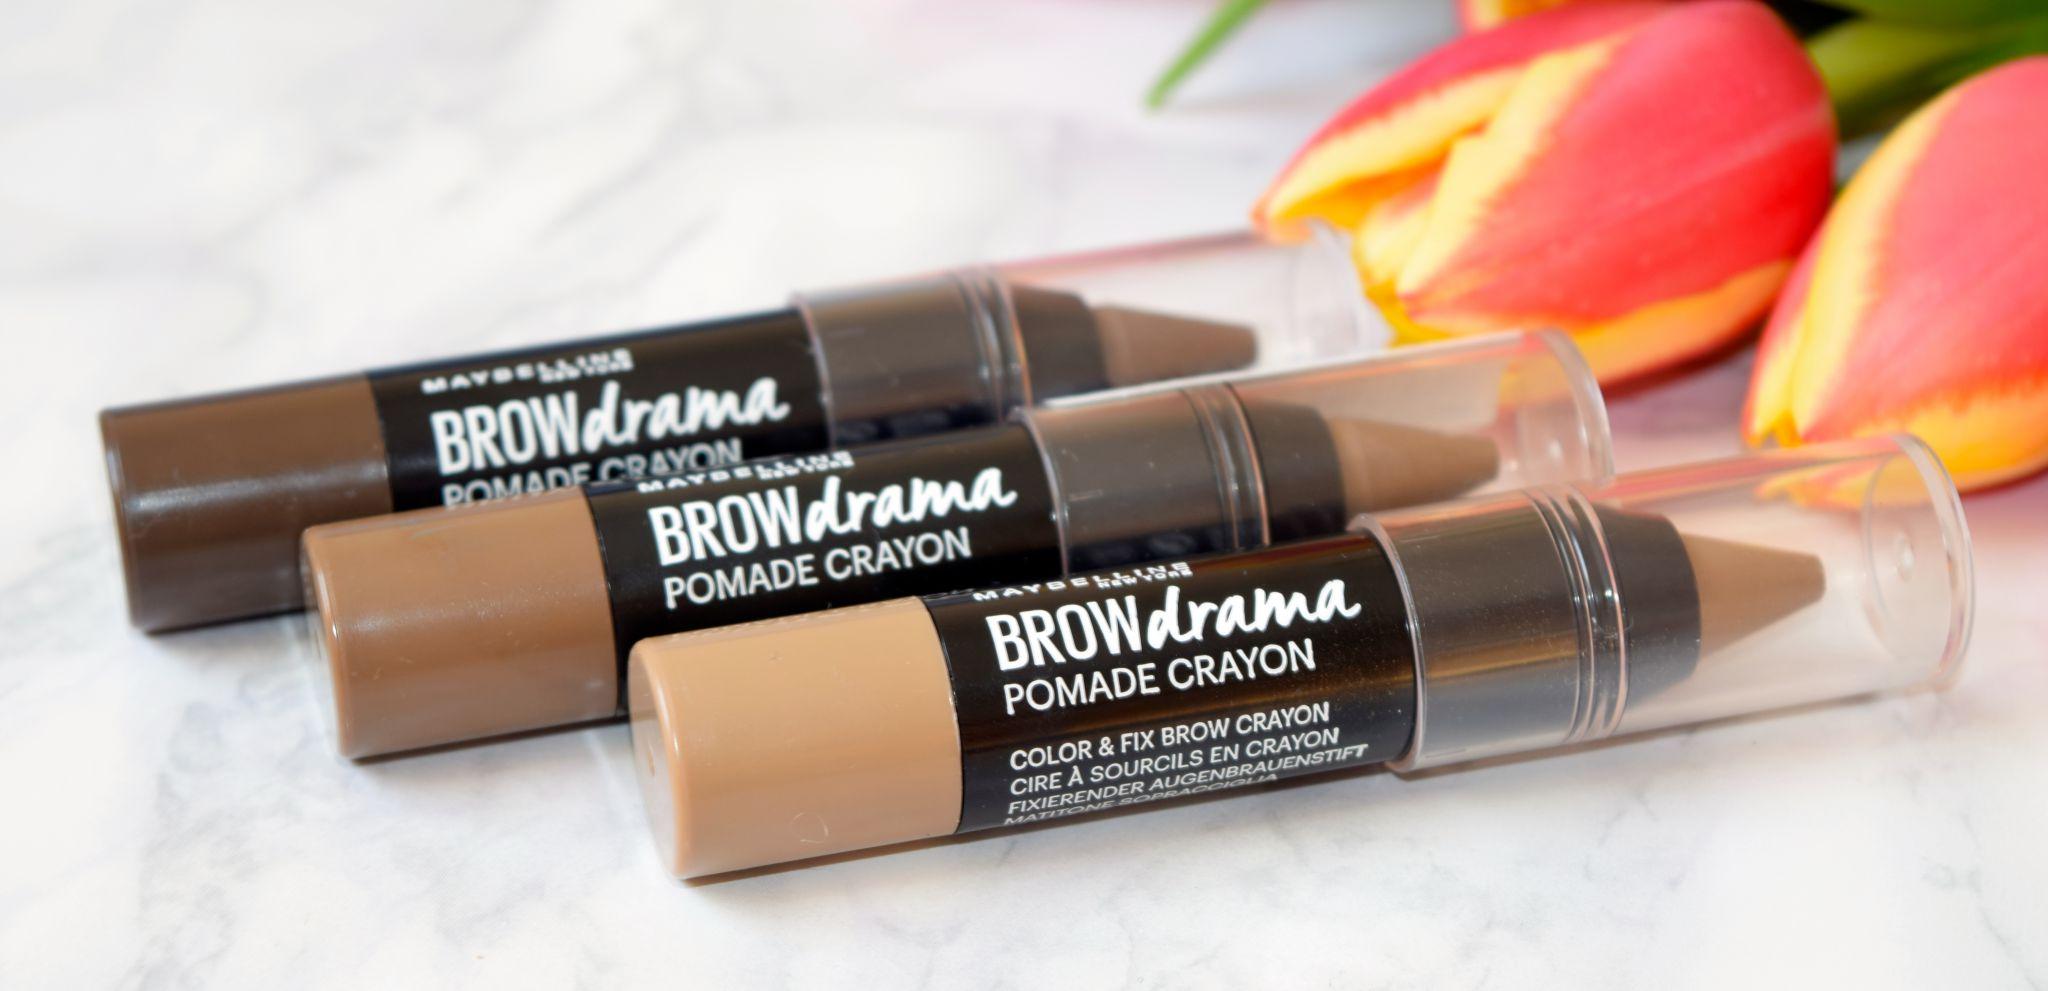 Maybelline Brow Drama Pomade Crayon